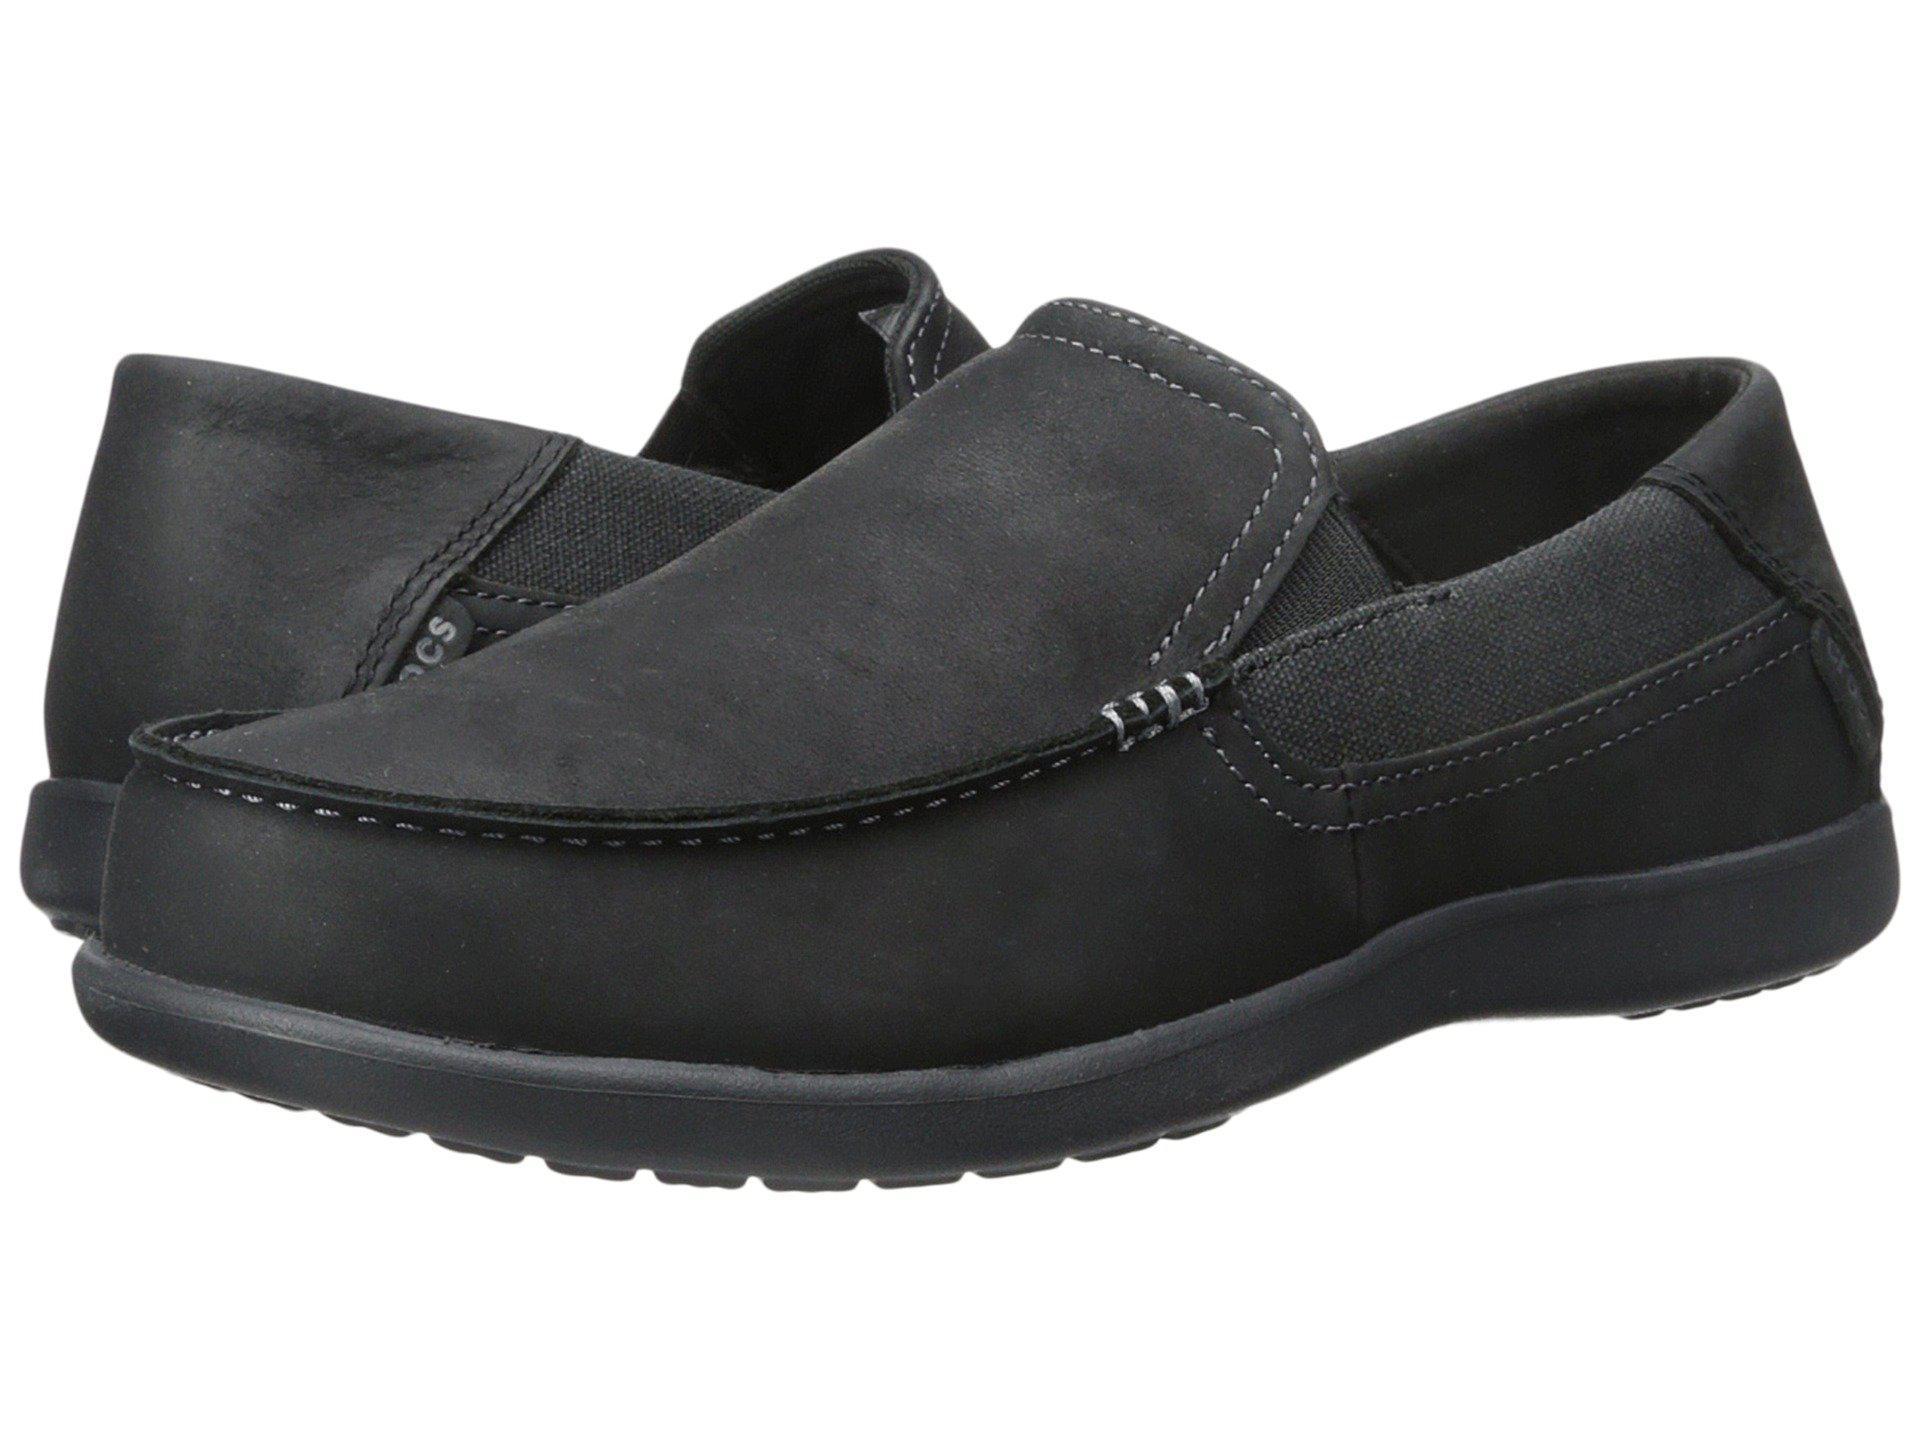 fb62f1c96 Lyst - Crocs™ Santa Cruz 2 Luxe Leather in Black for Men - Save 47%